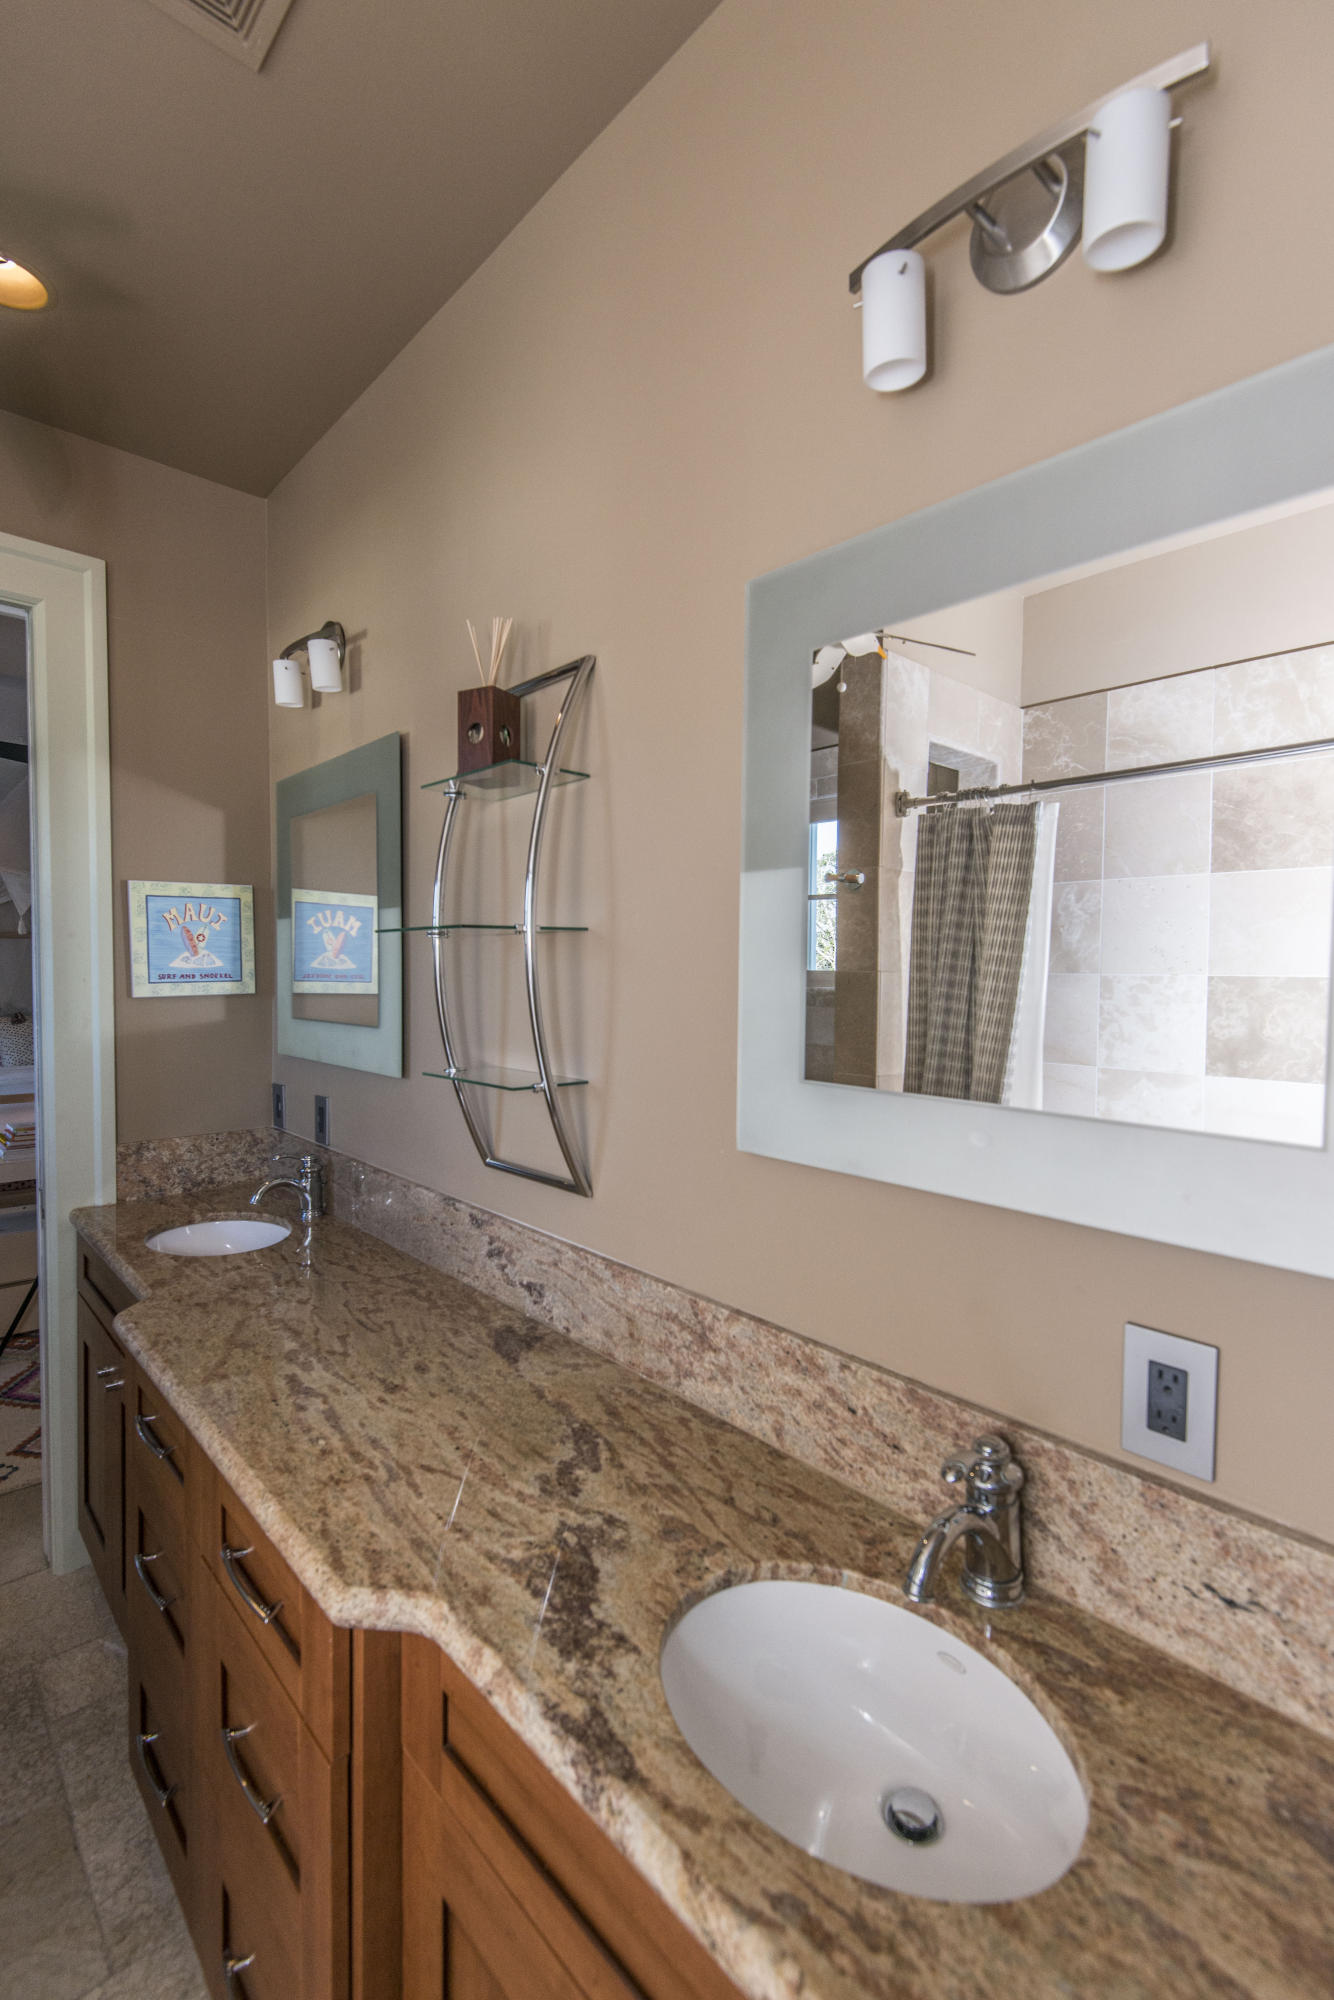 Saltgrass Pointe Homes For Sale - 916 Mciver, Mount Pleasant, SC - 32